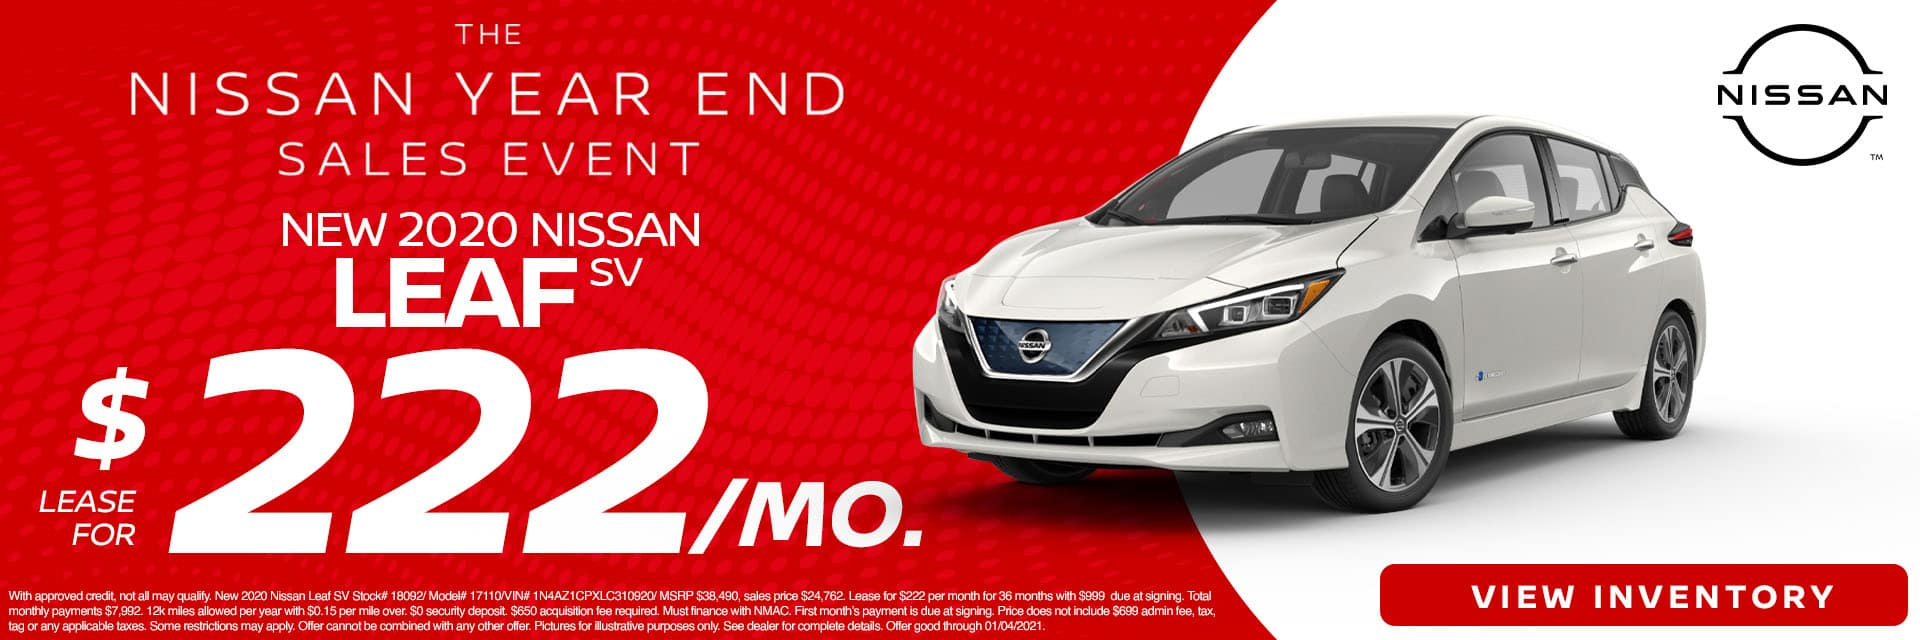 CNSN-December 2020-2020 Nissan Leaf